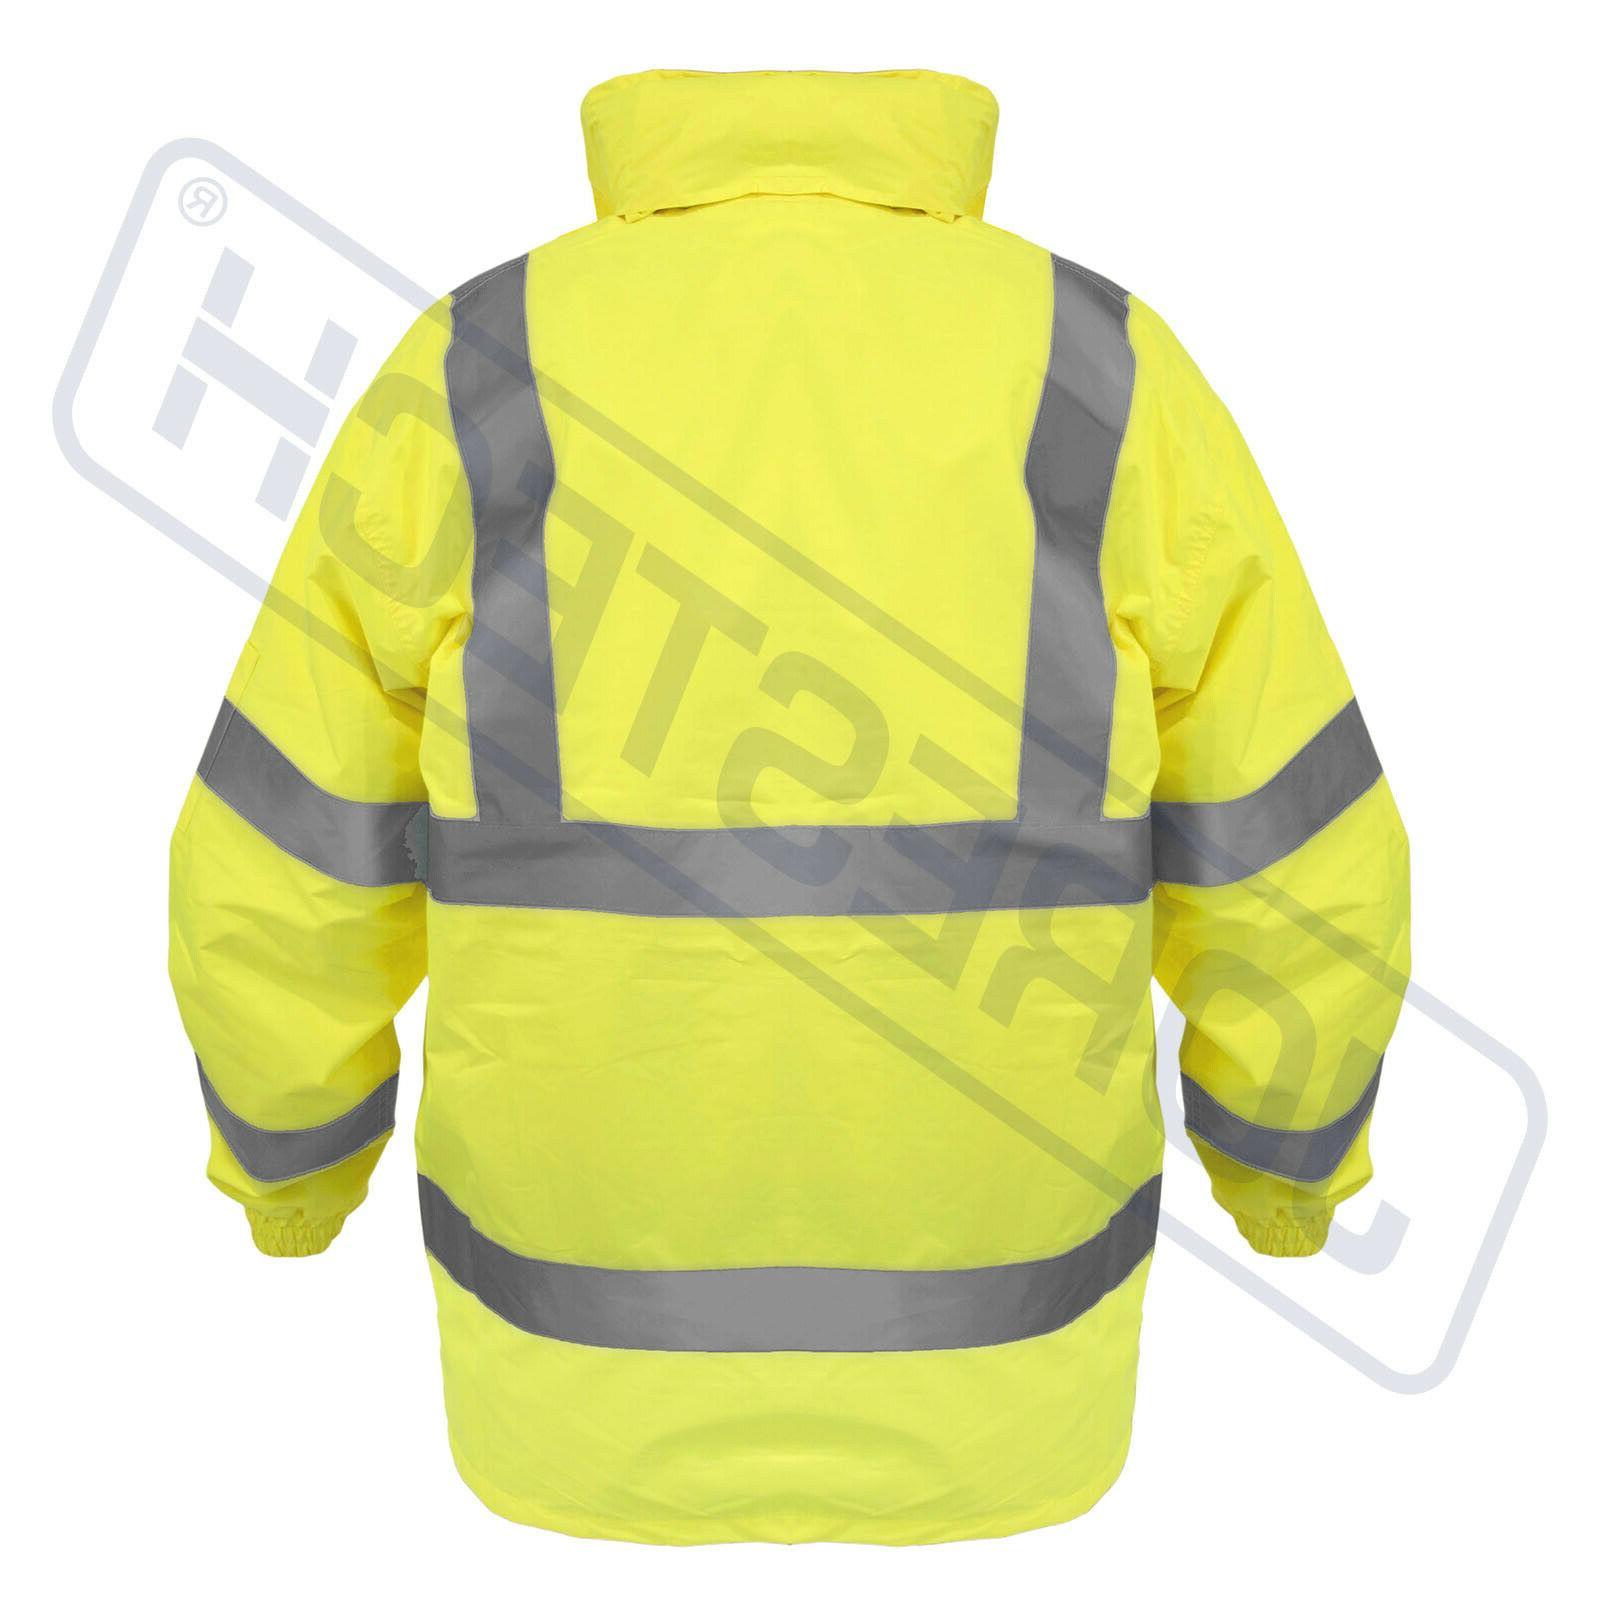 Safety Jacket Green Rainjacket w